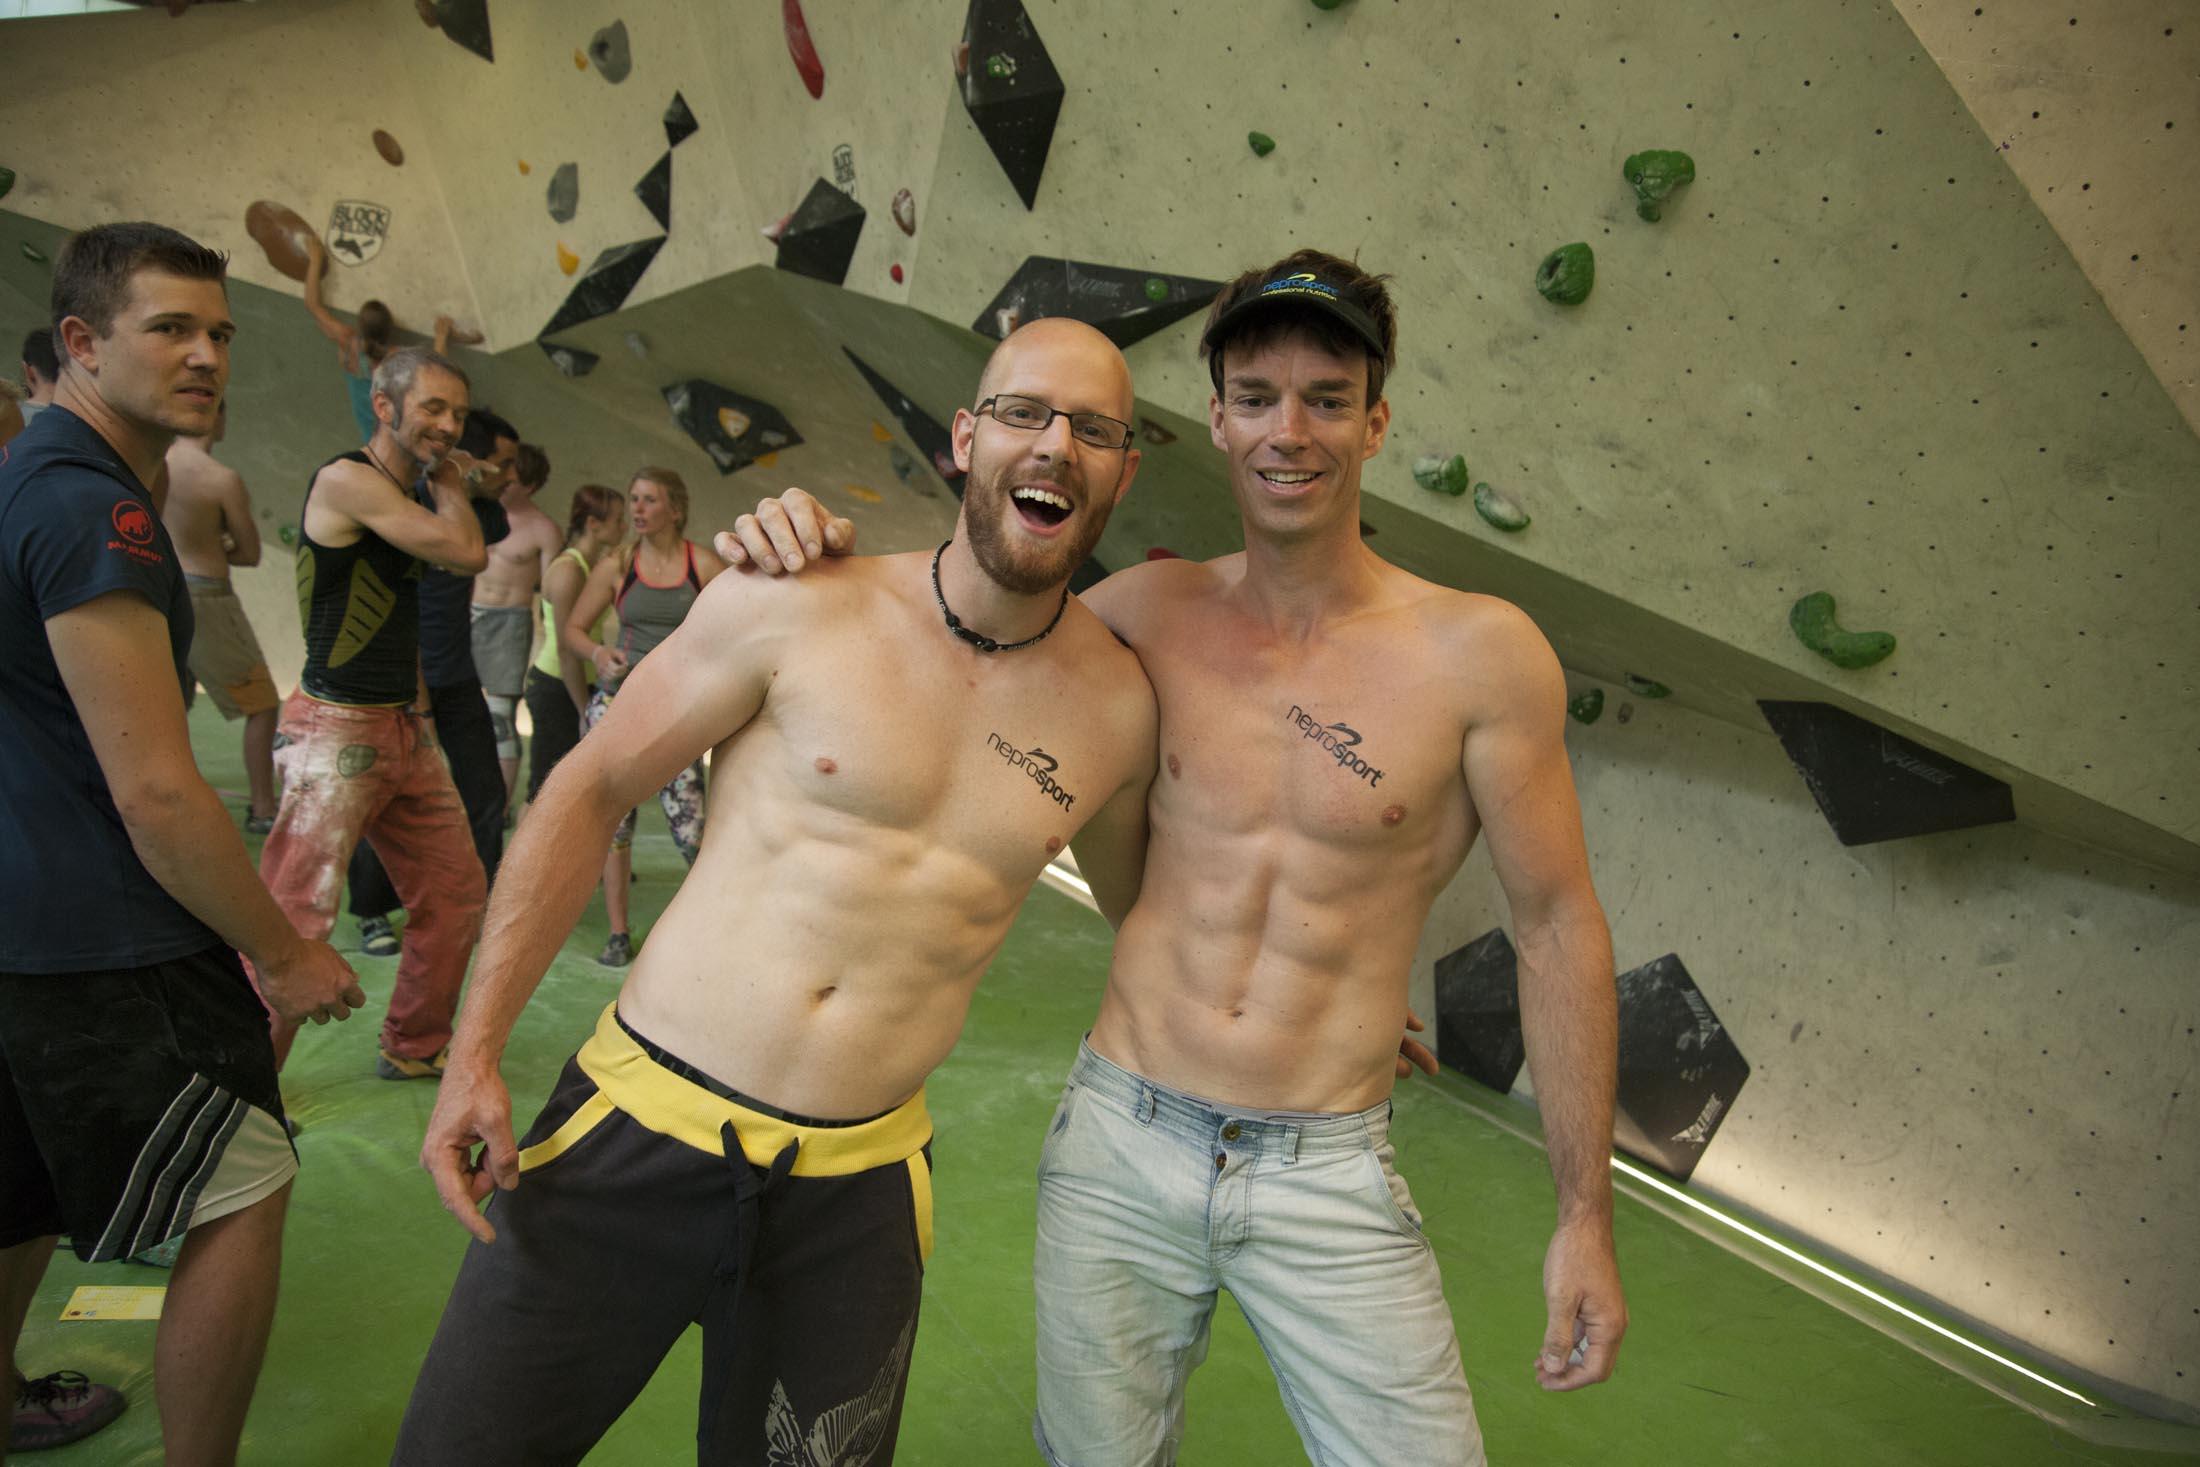 Quali, internationaler bouldercup Frankenjura 2016, BLOCKHELDEN Erlangen, Mammut, Bergfreunde.de, Boulderwettkampf07092016161